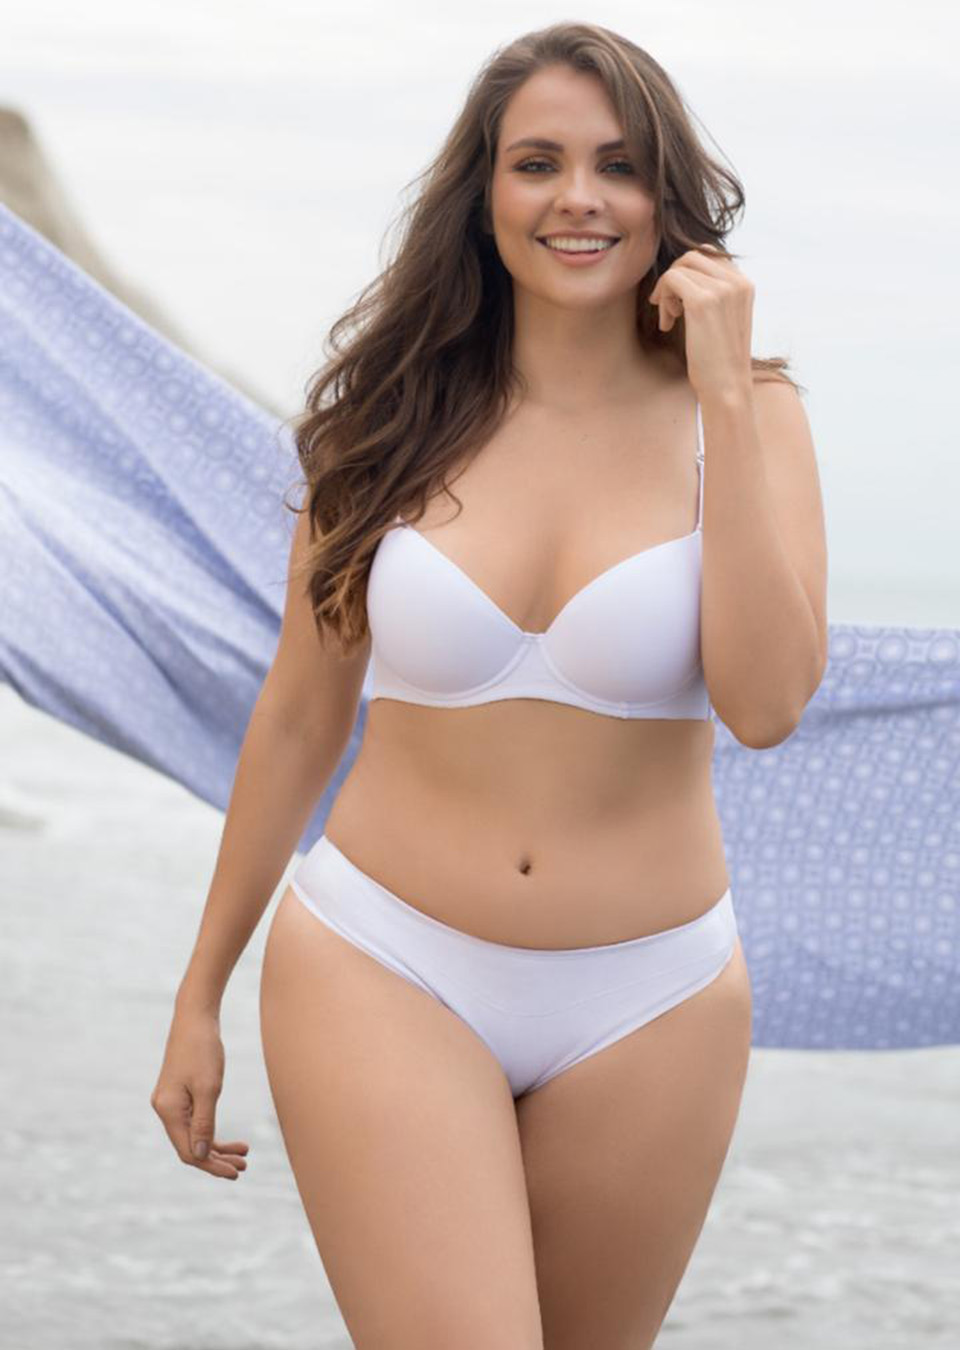 alejandra echeverri (3)